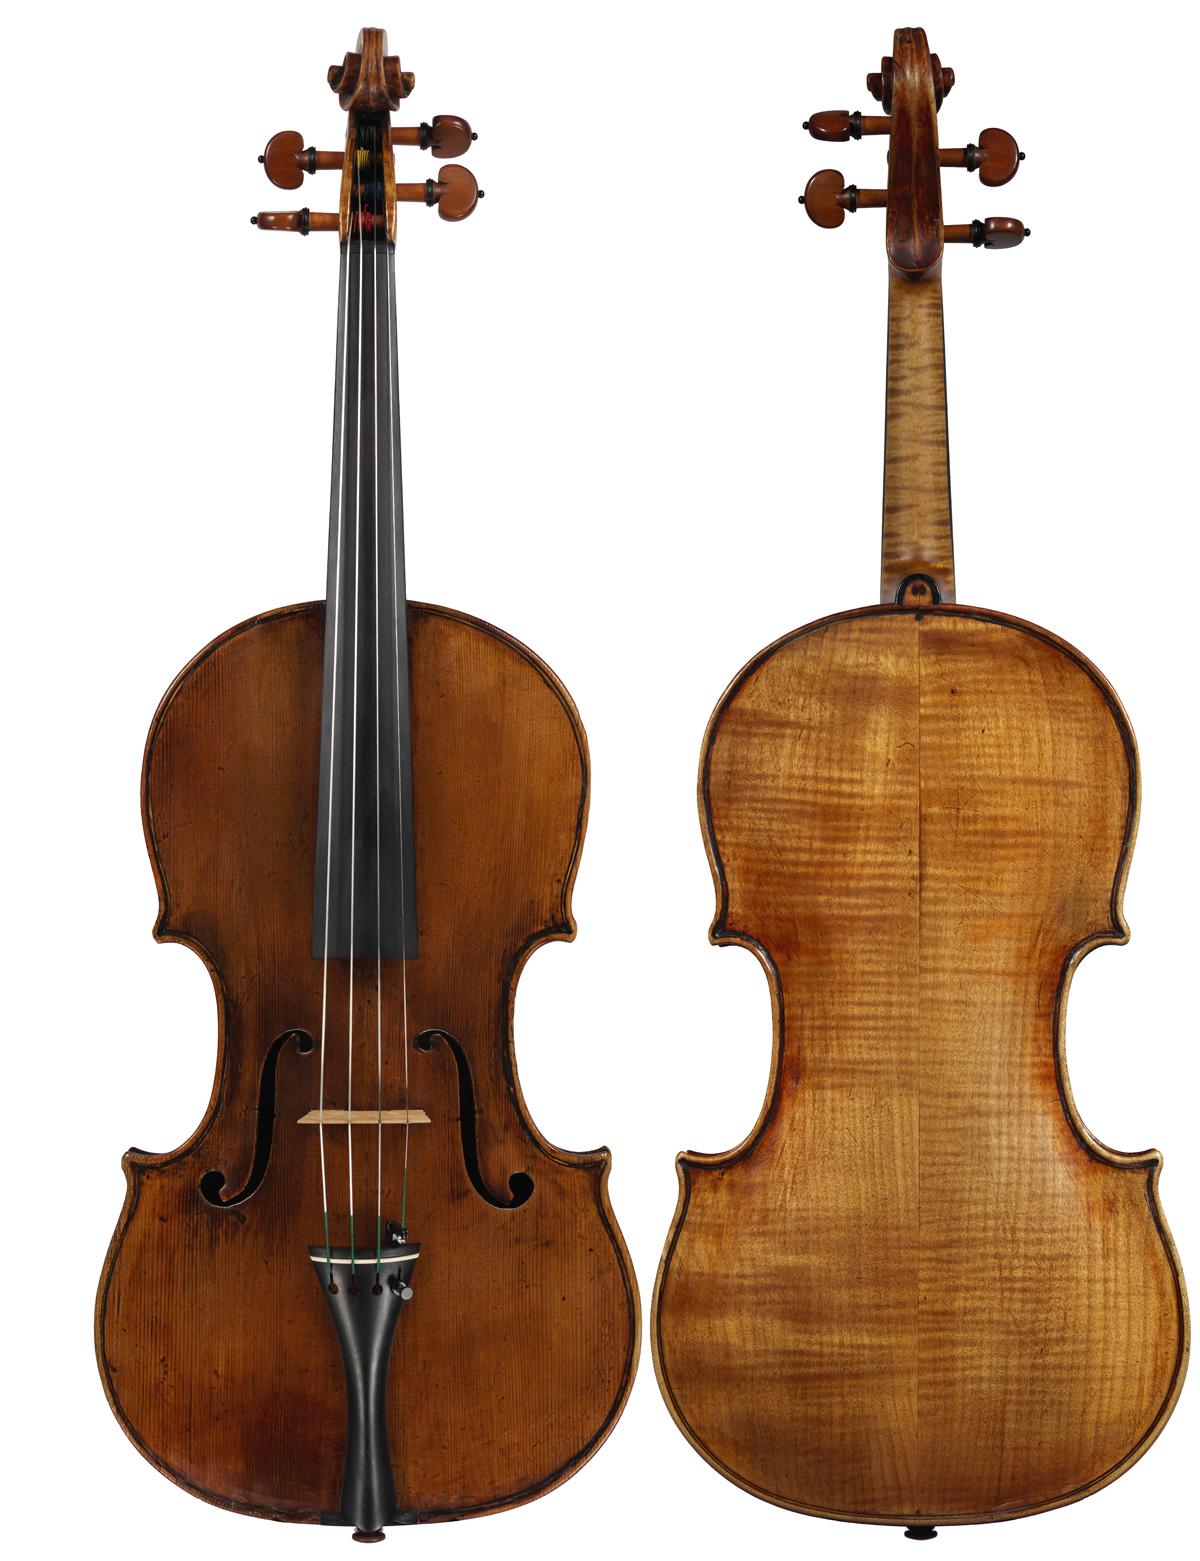 Viola by Gaspare Lorenzini